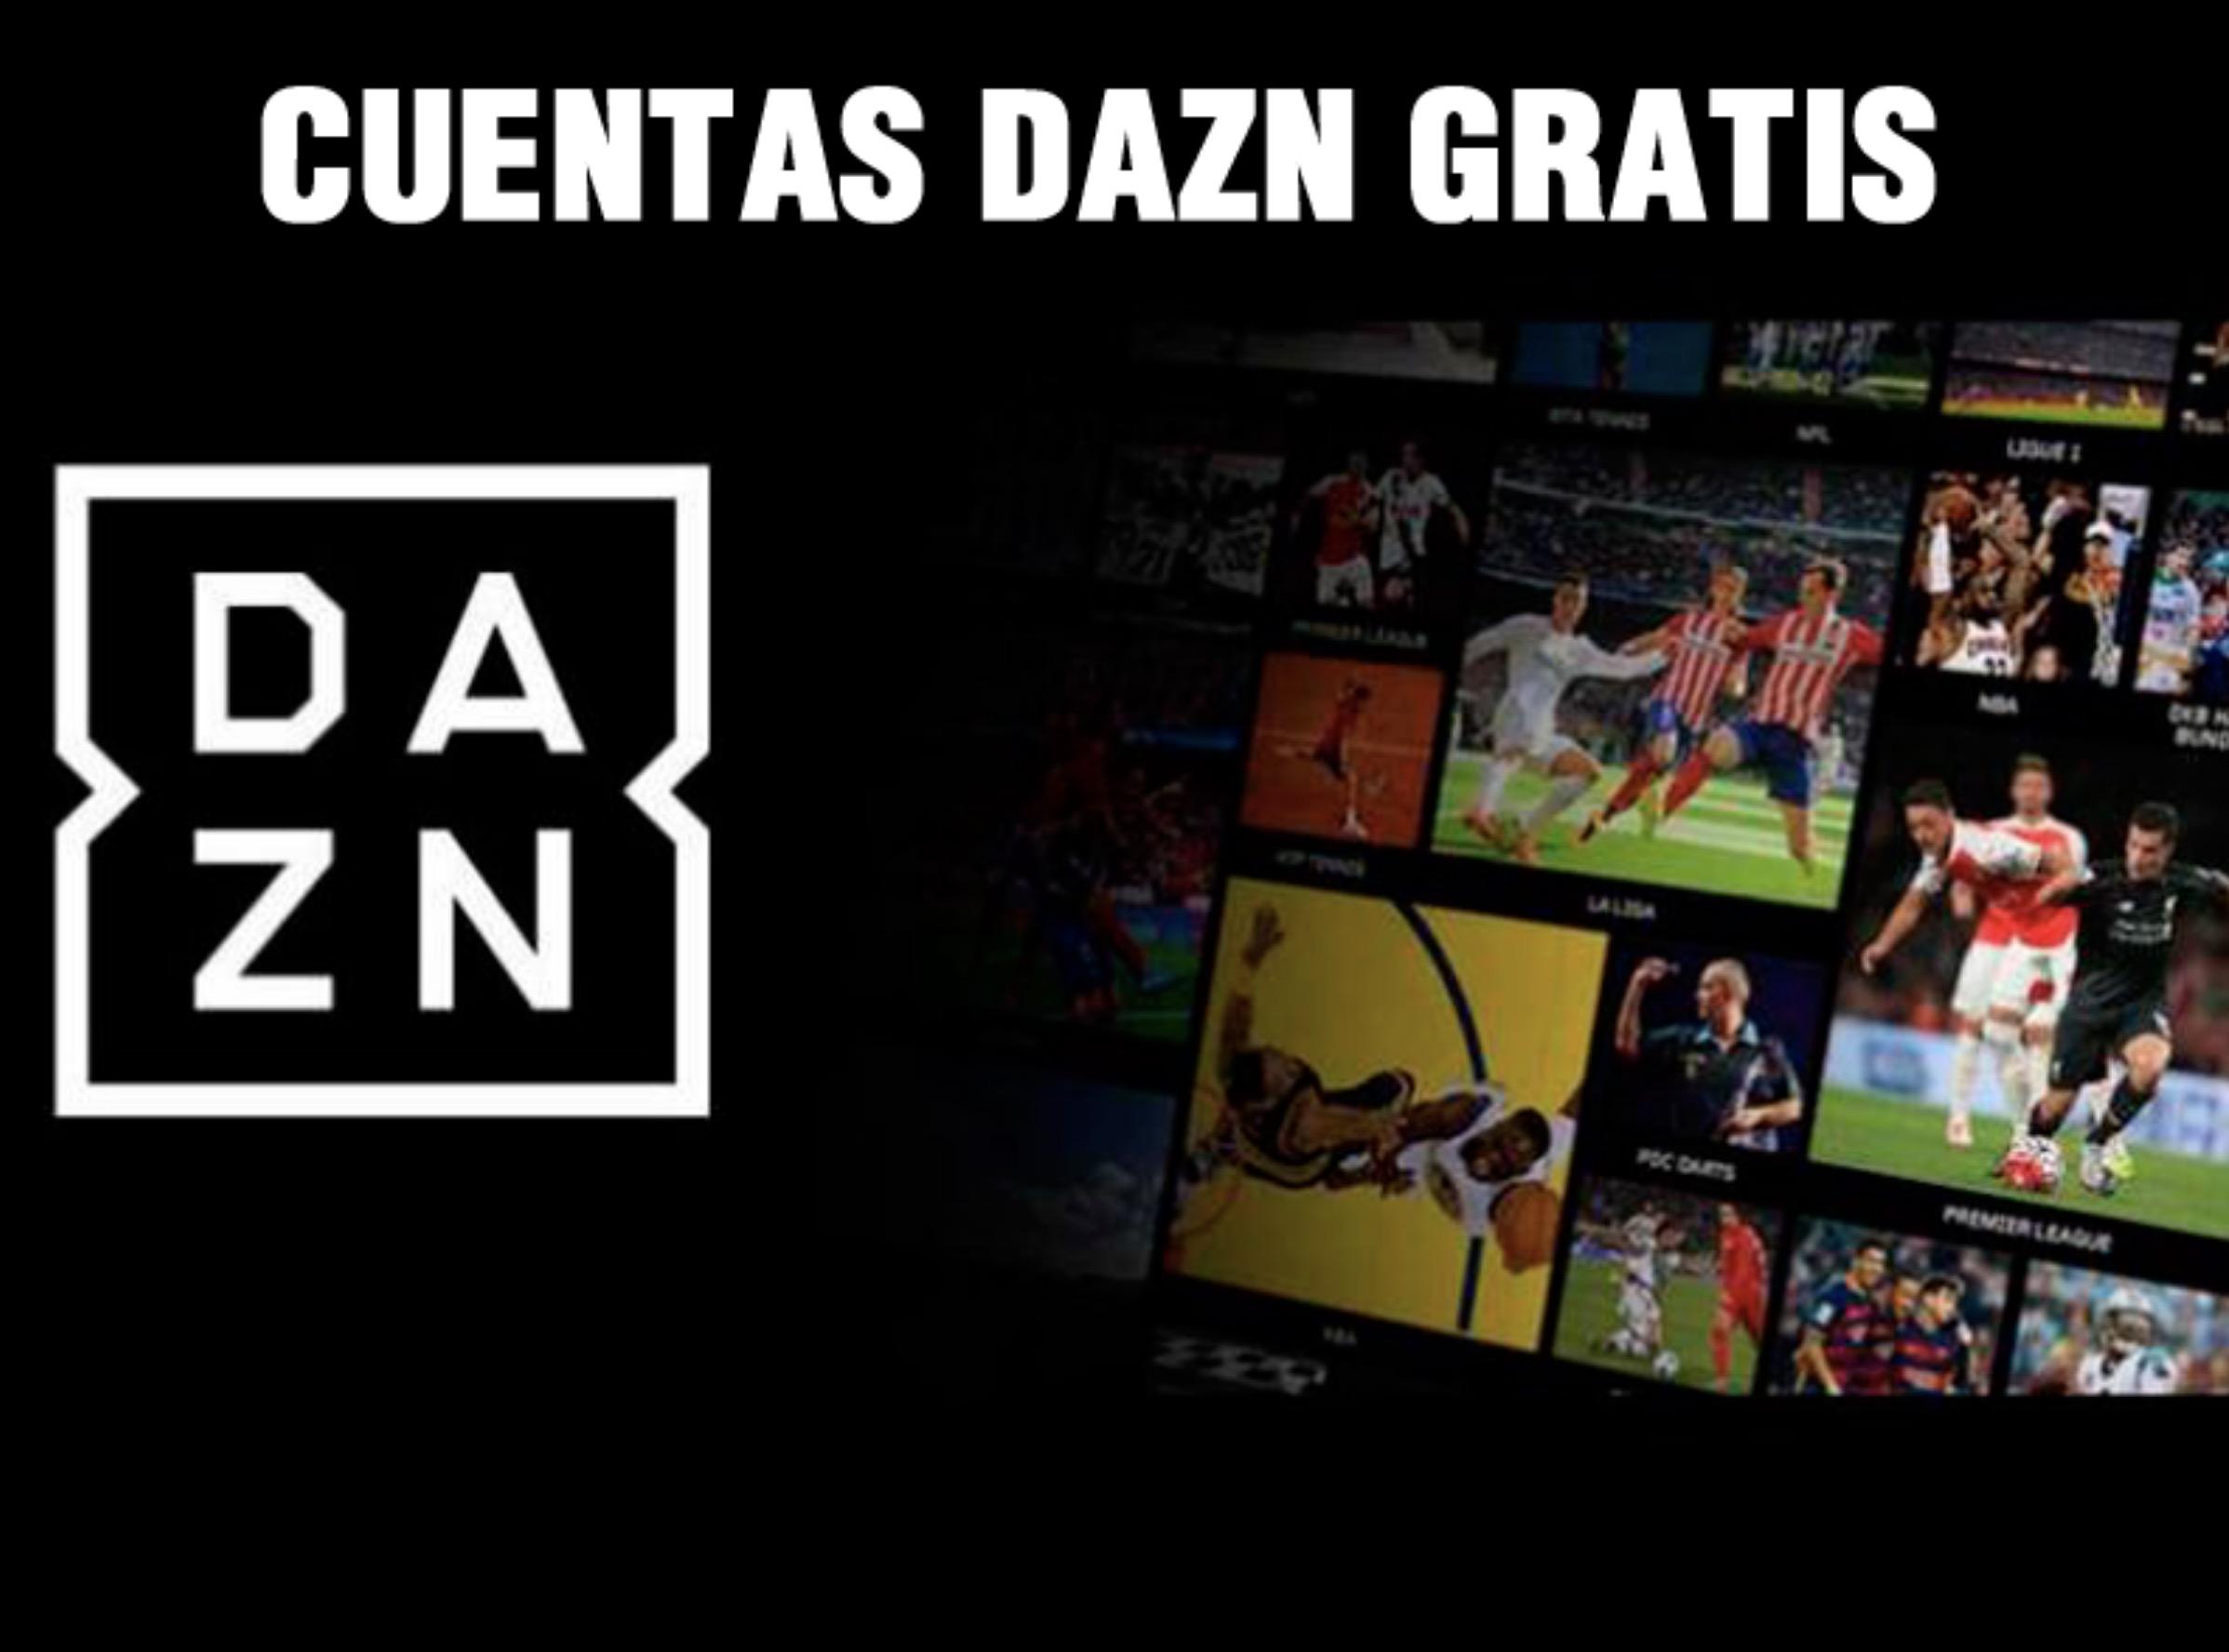 DAZN Cuenta gratis